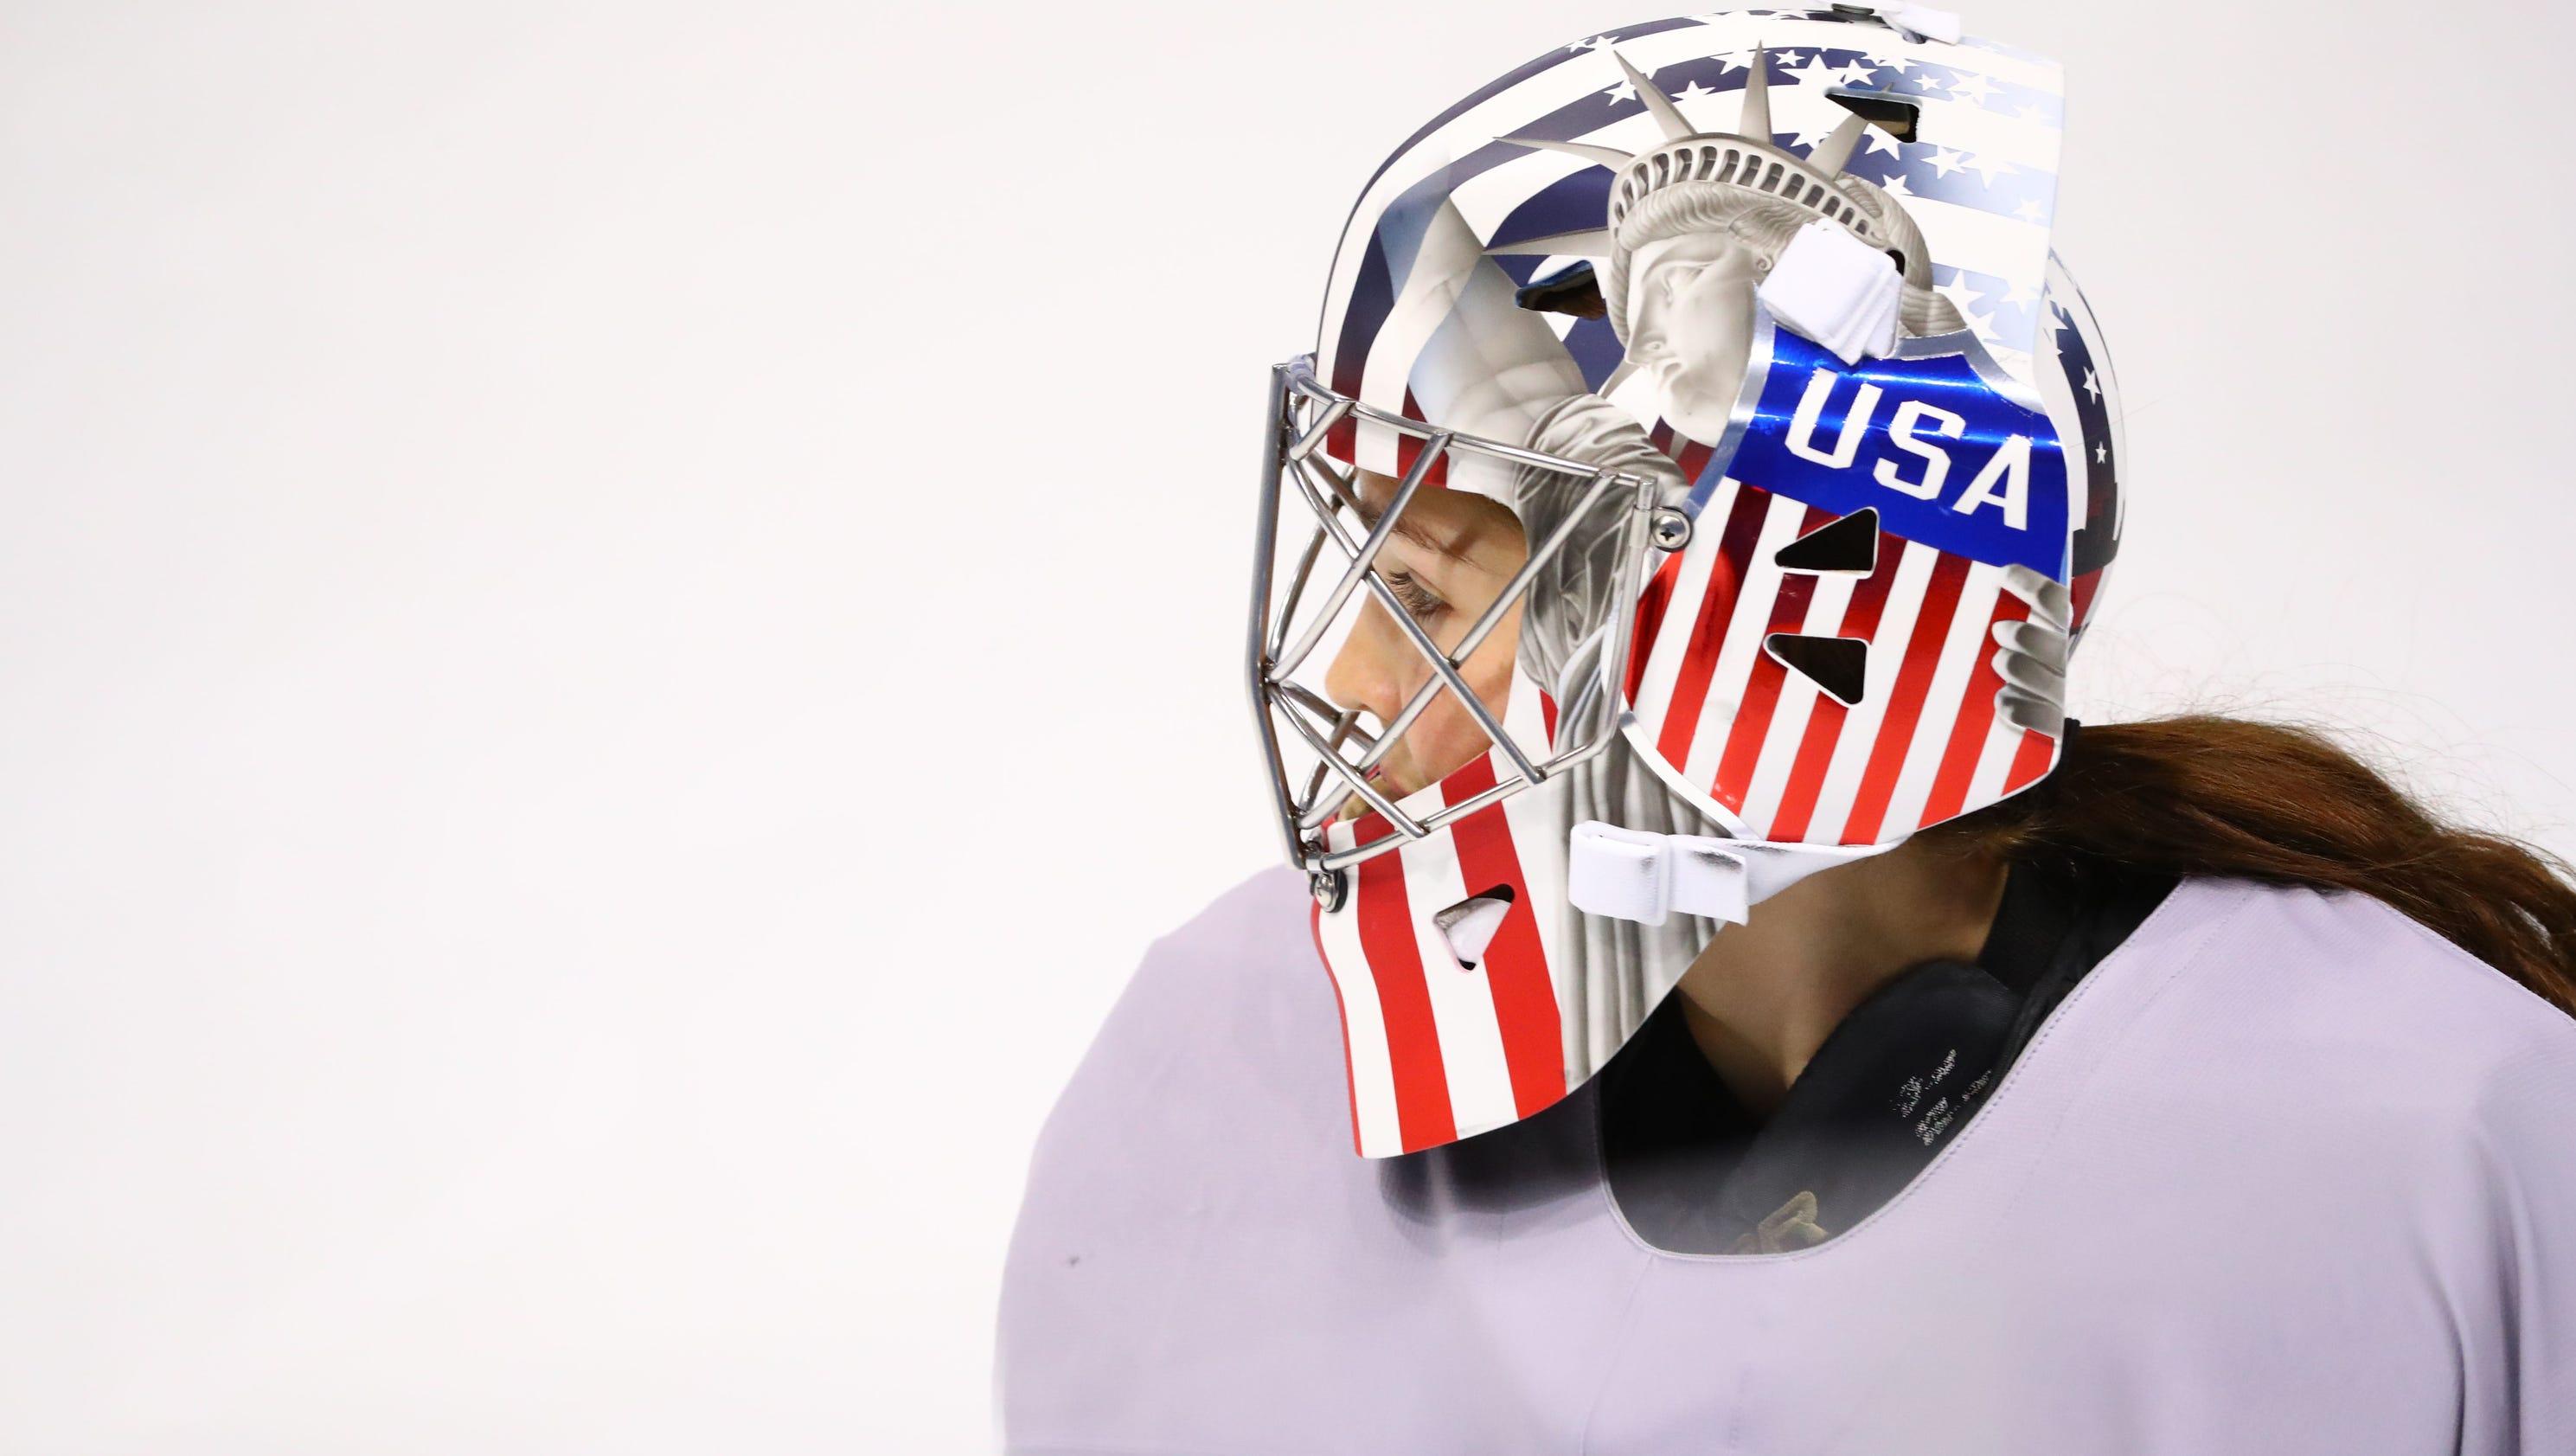 636538164236010213-usp-olympics--women-s-ice-hockey-training